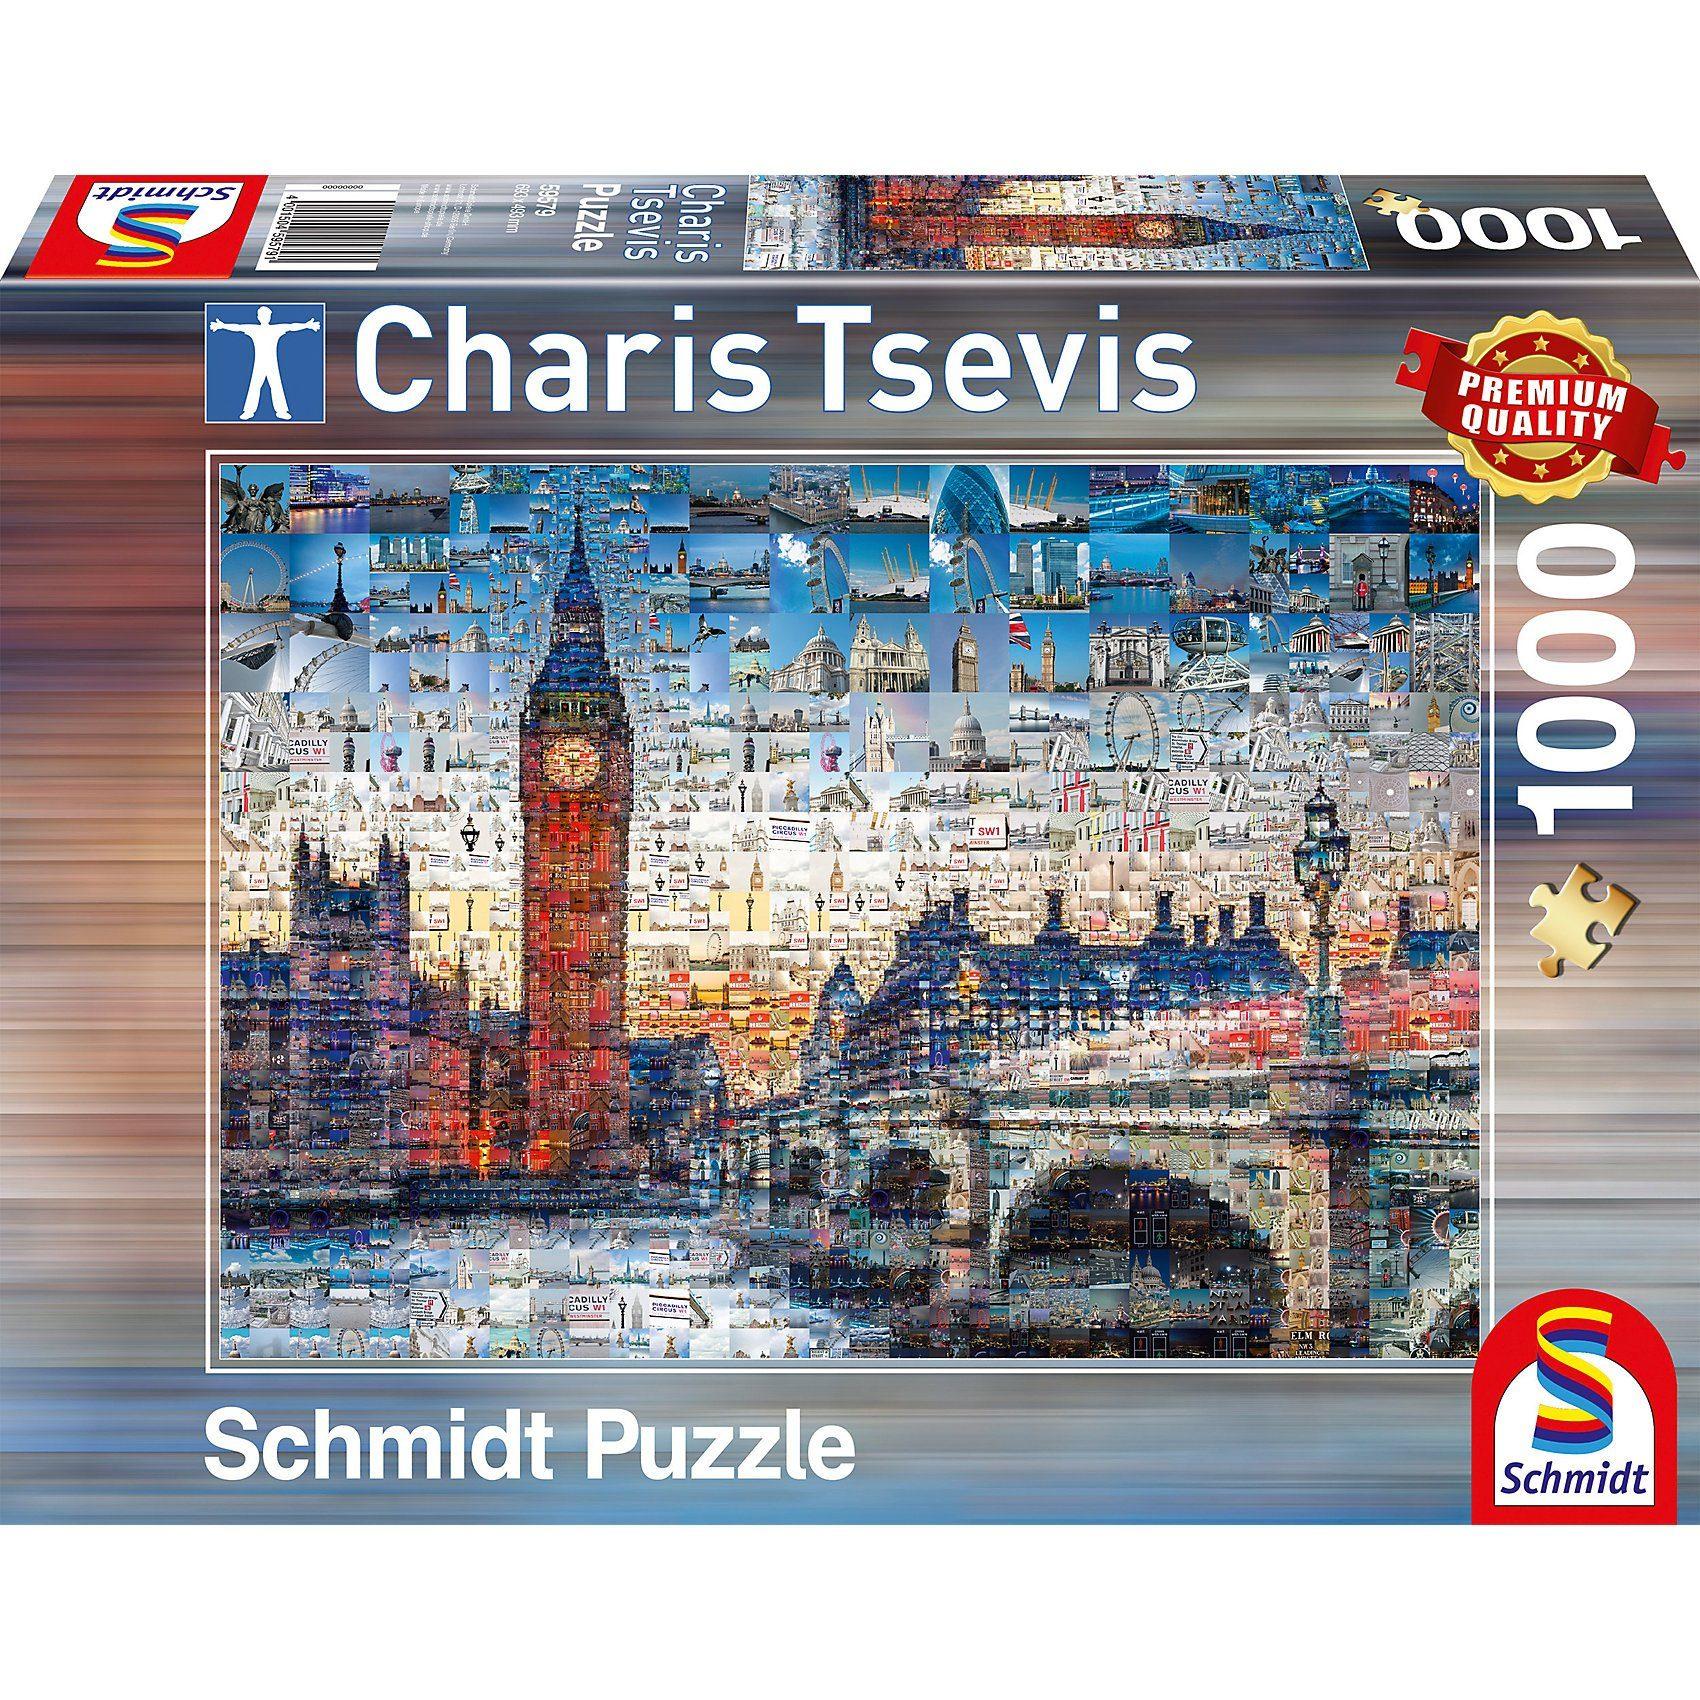 Schmidt Spiele Puzzle 1000 Teile London von Charis Tsevis